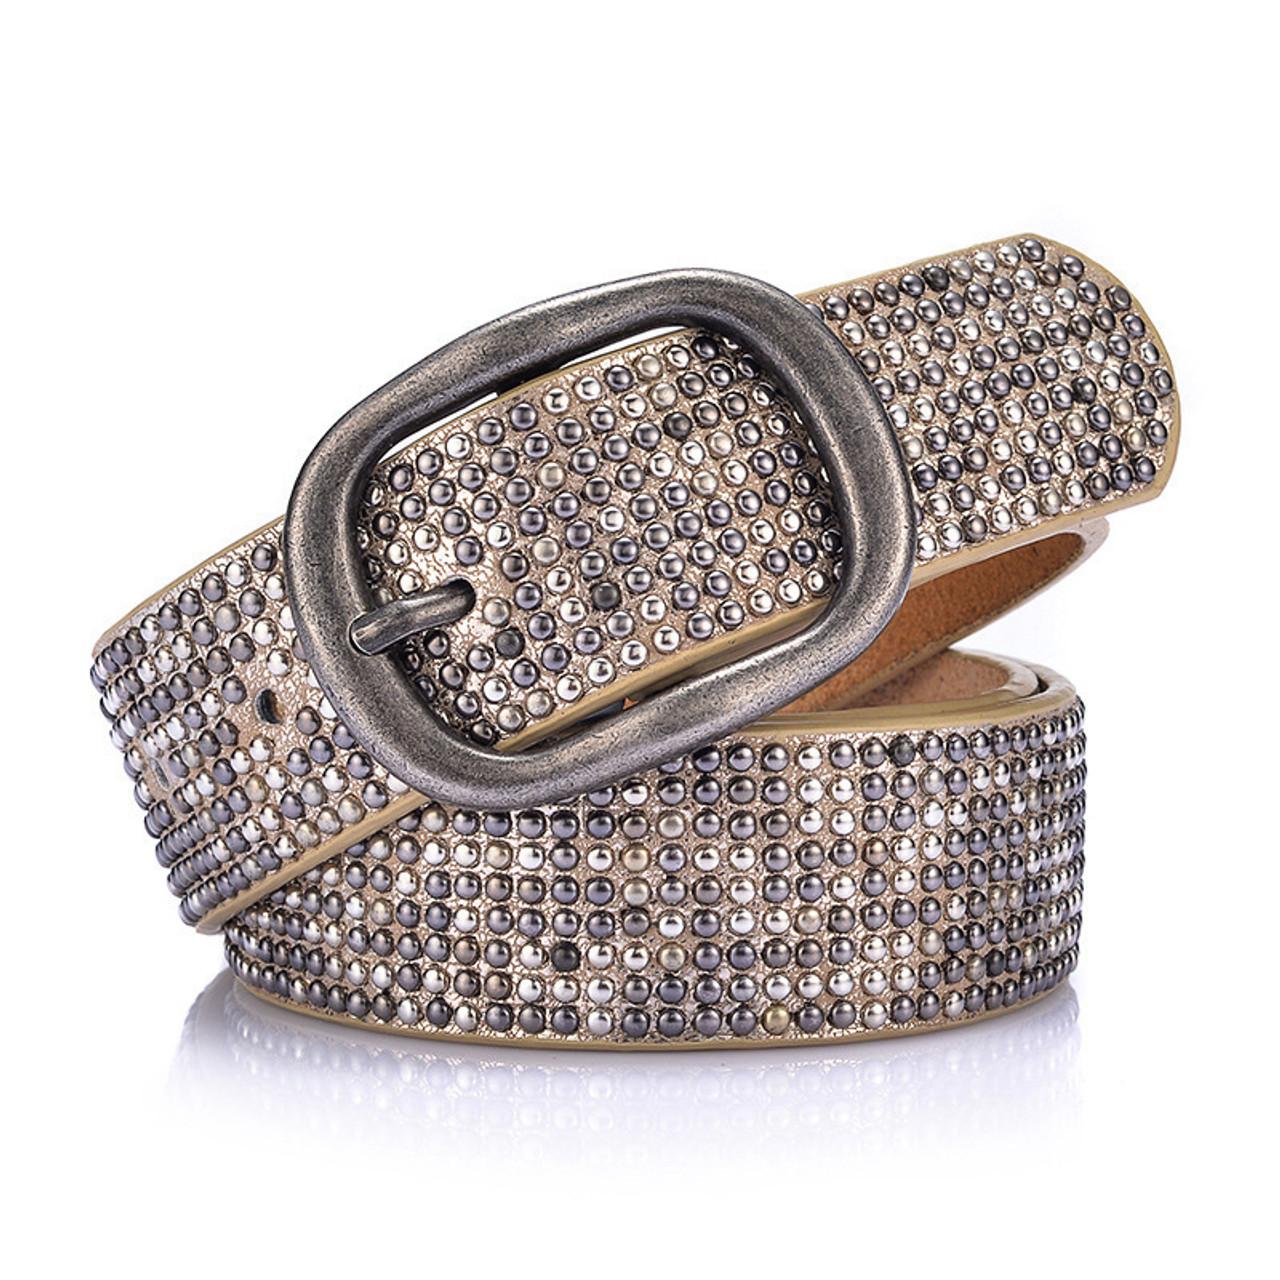 8ce5ccf2f54 2018 Rivet Genuine Cowskin Leather Belt Ladies Men Vintage Cowboy Belts  Steel Pin Buckle Waistband Punk Style Do old Women Belt